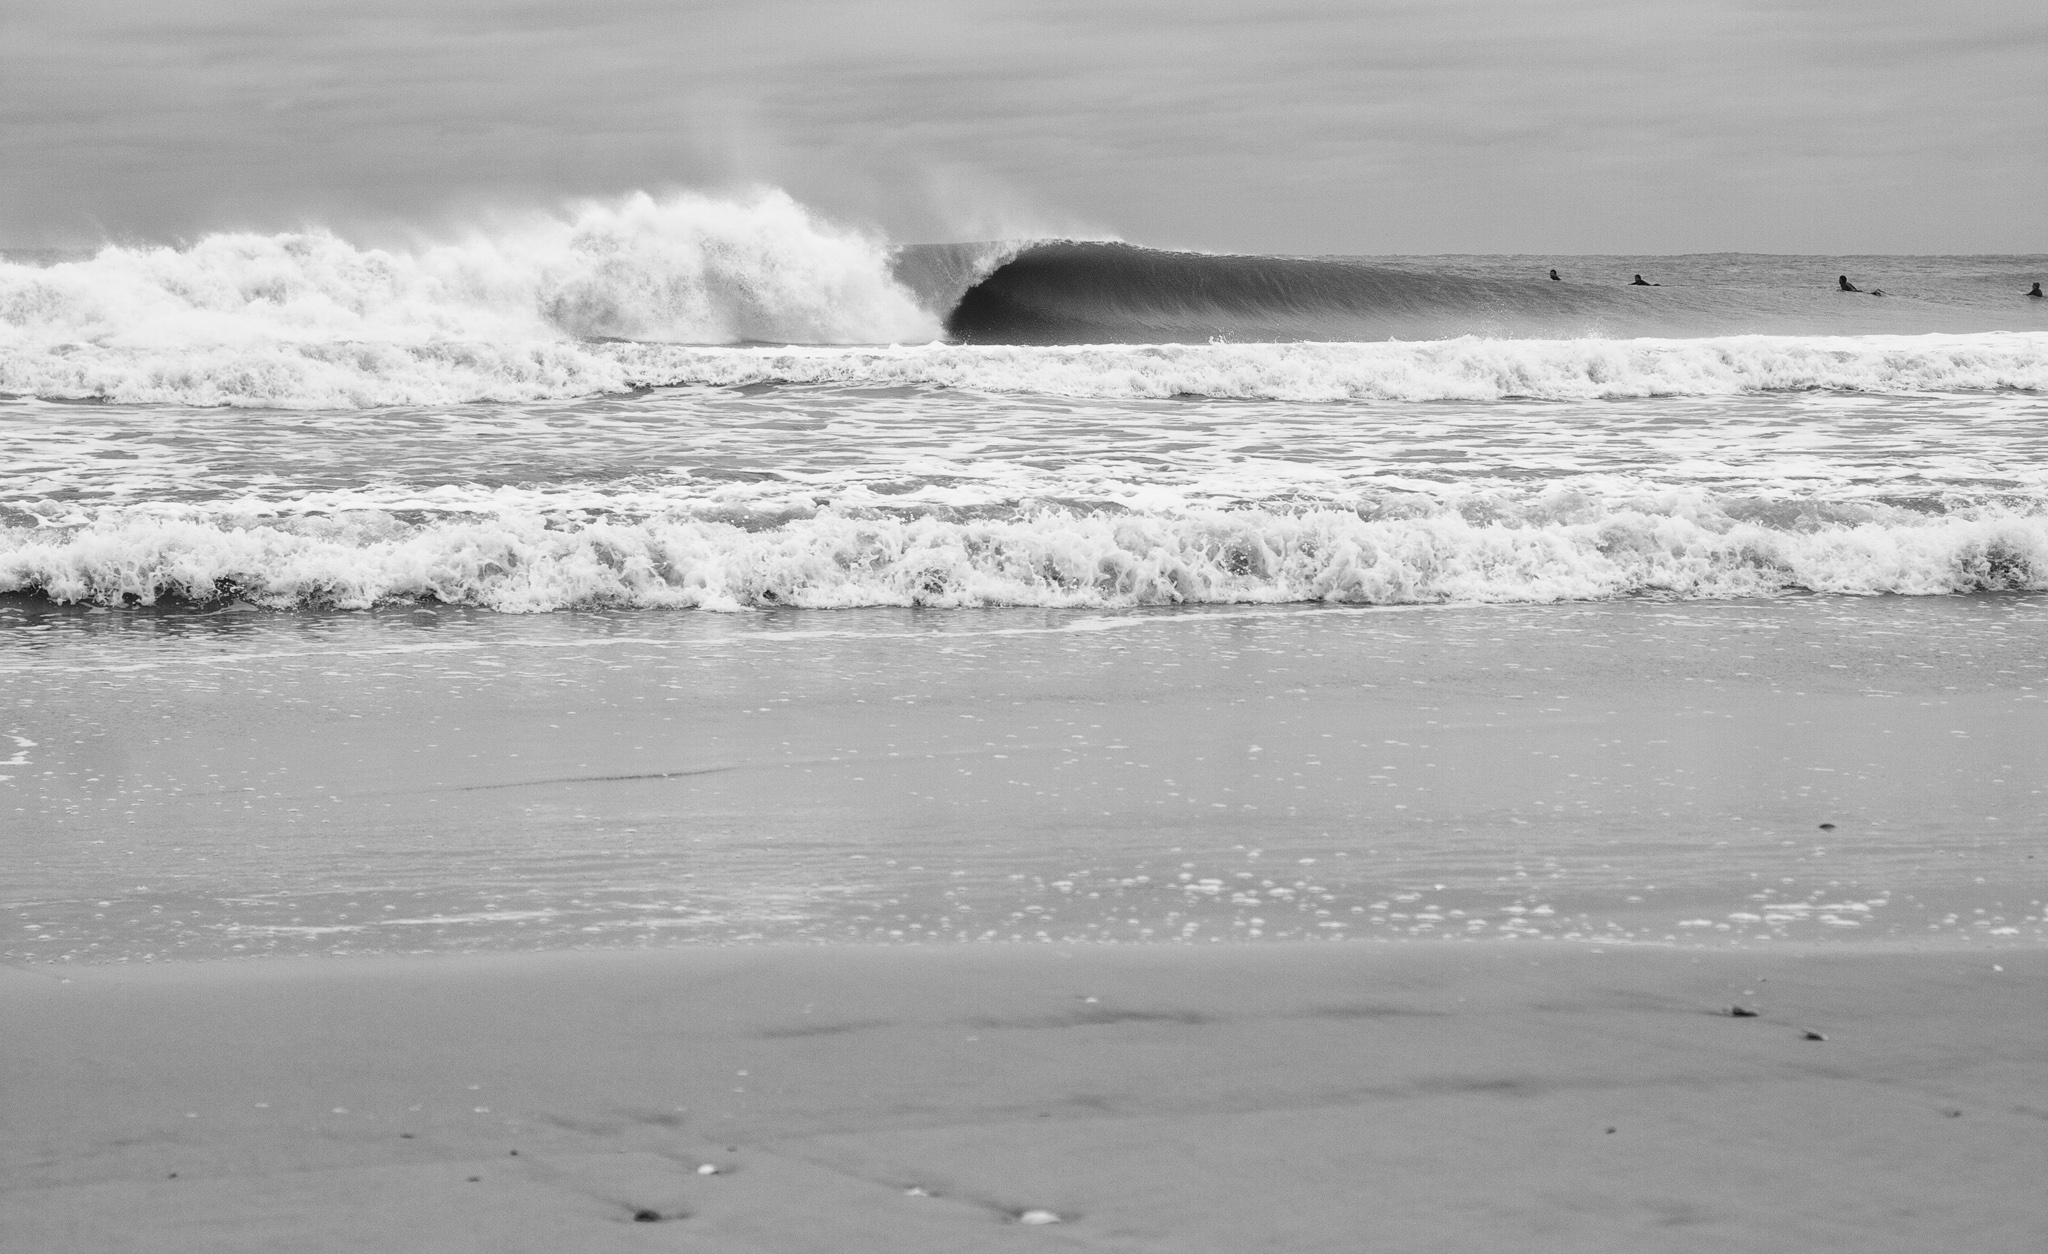 /photo/2012/1031/as_surf_sandy5_2048.jpg